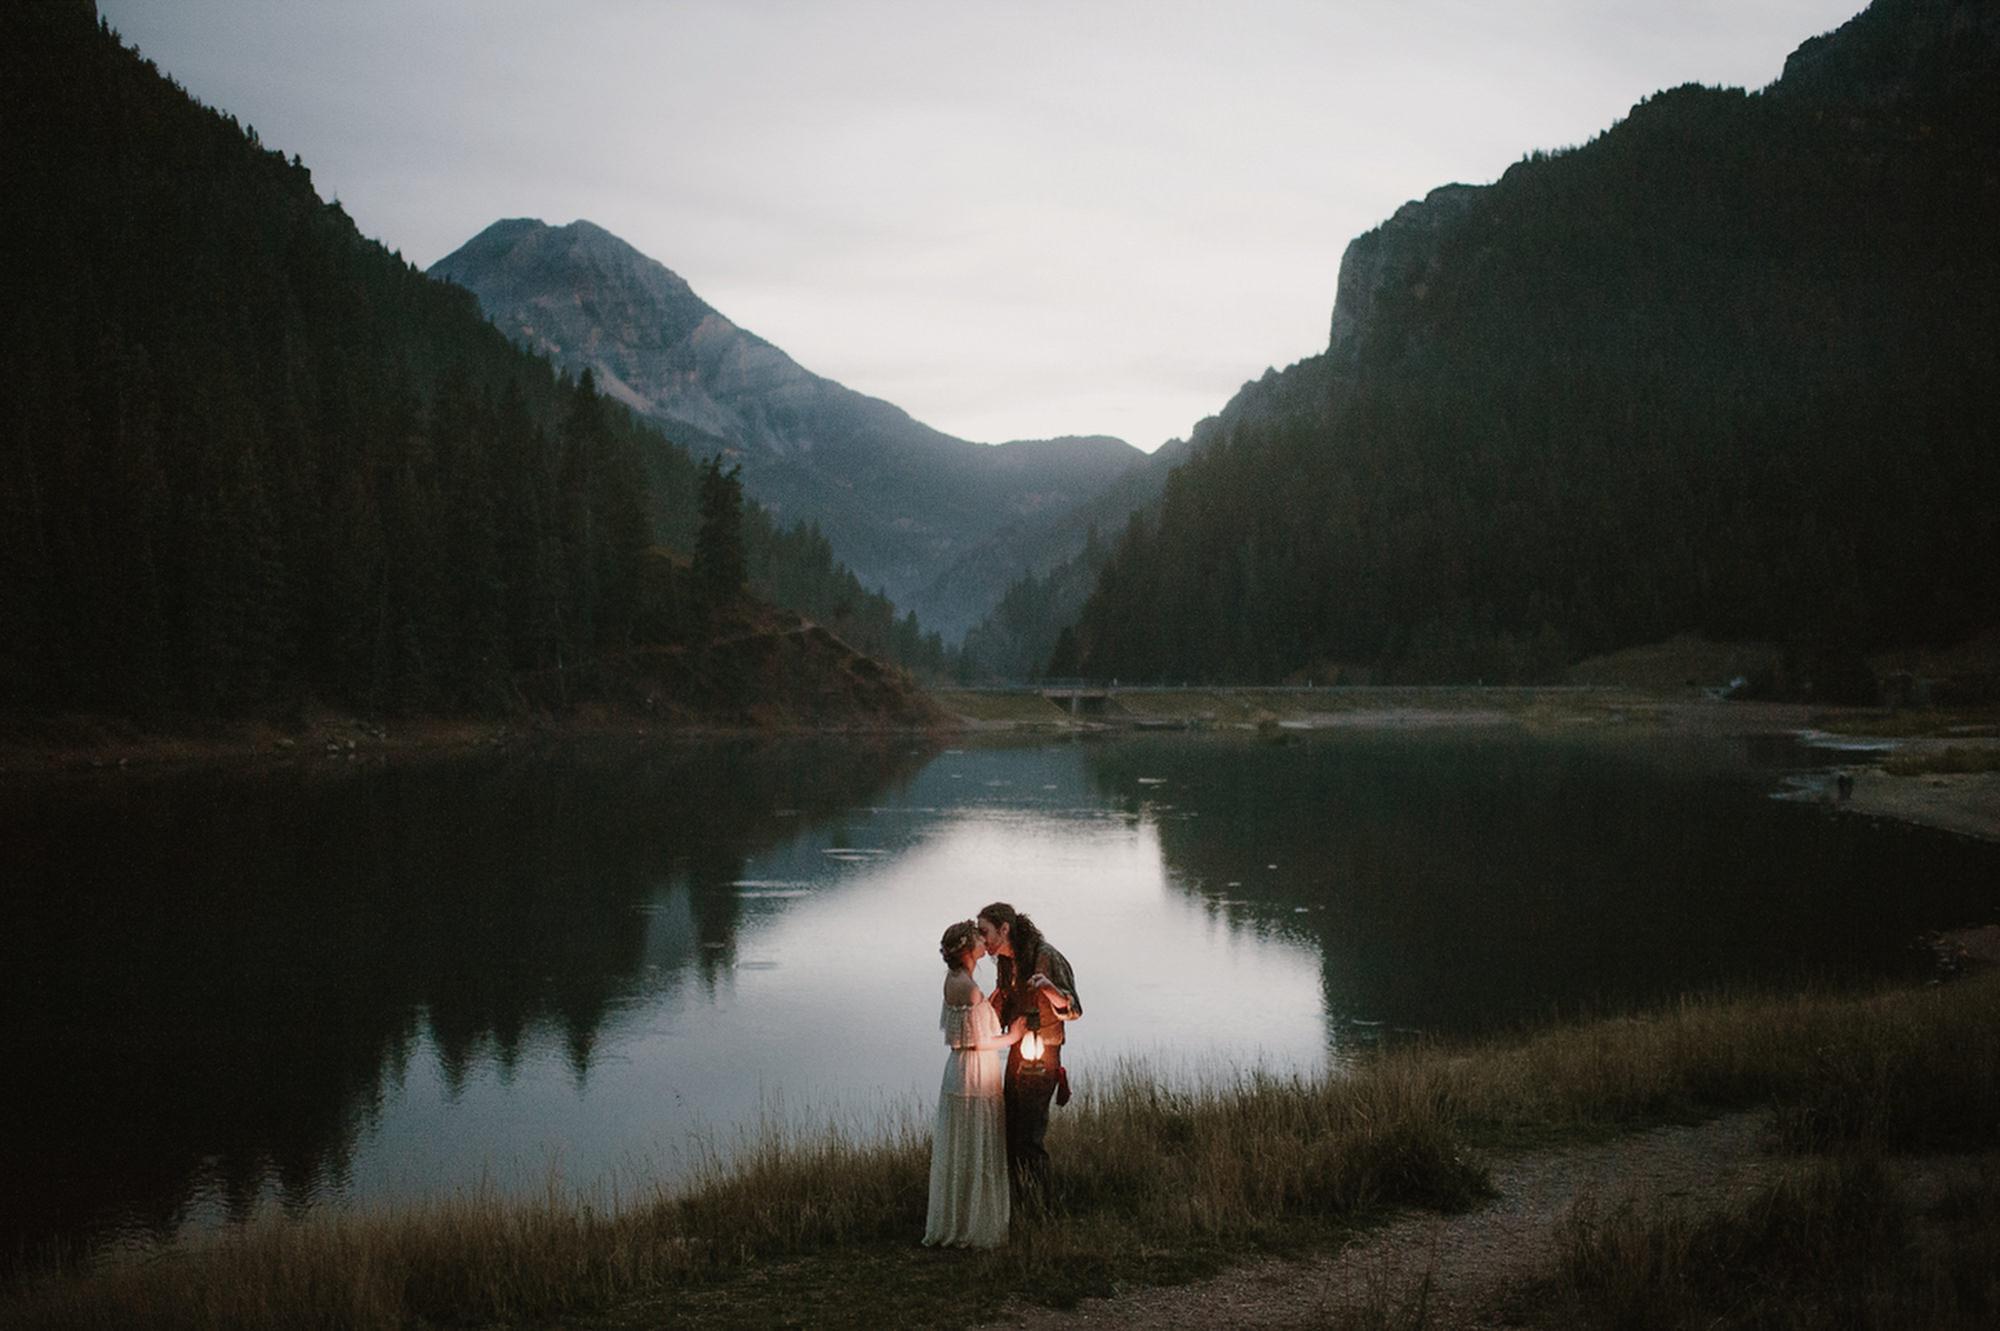 Lantern lit portrait of PNW couple at lake  - photo by Kristen Marie Parker